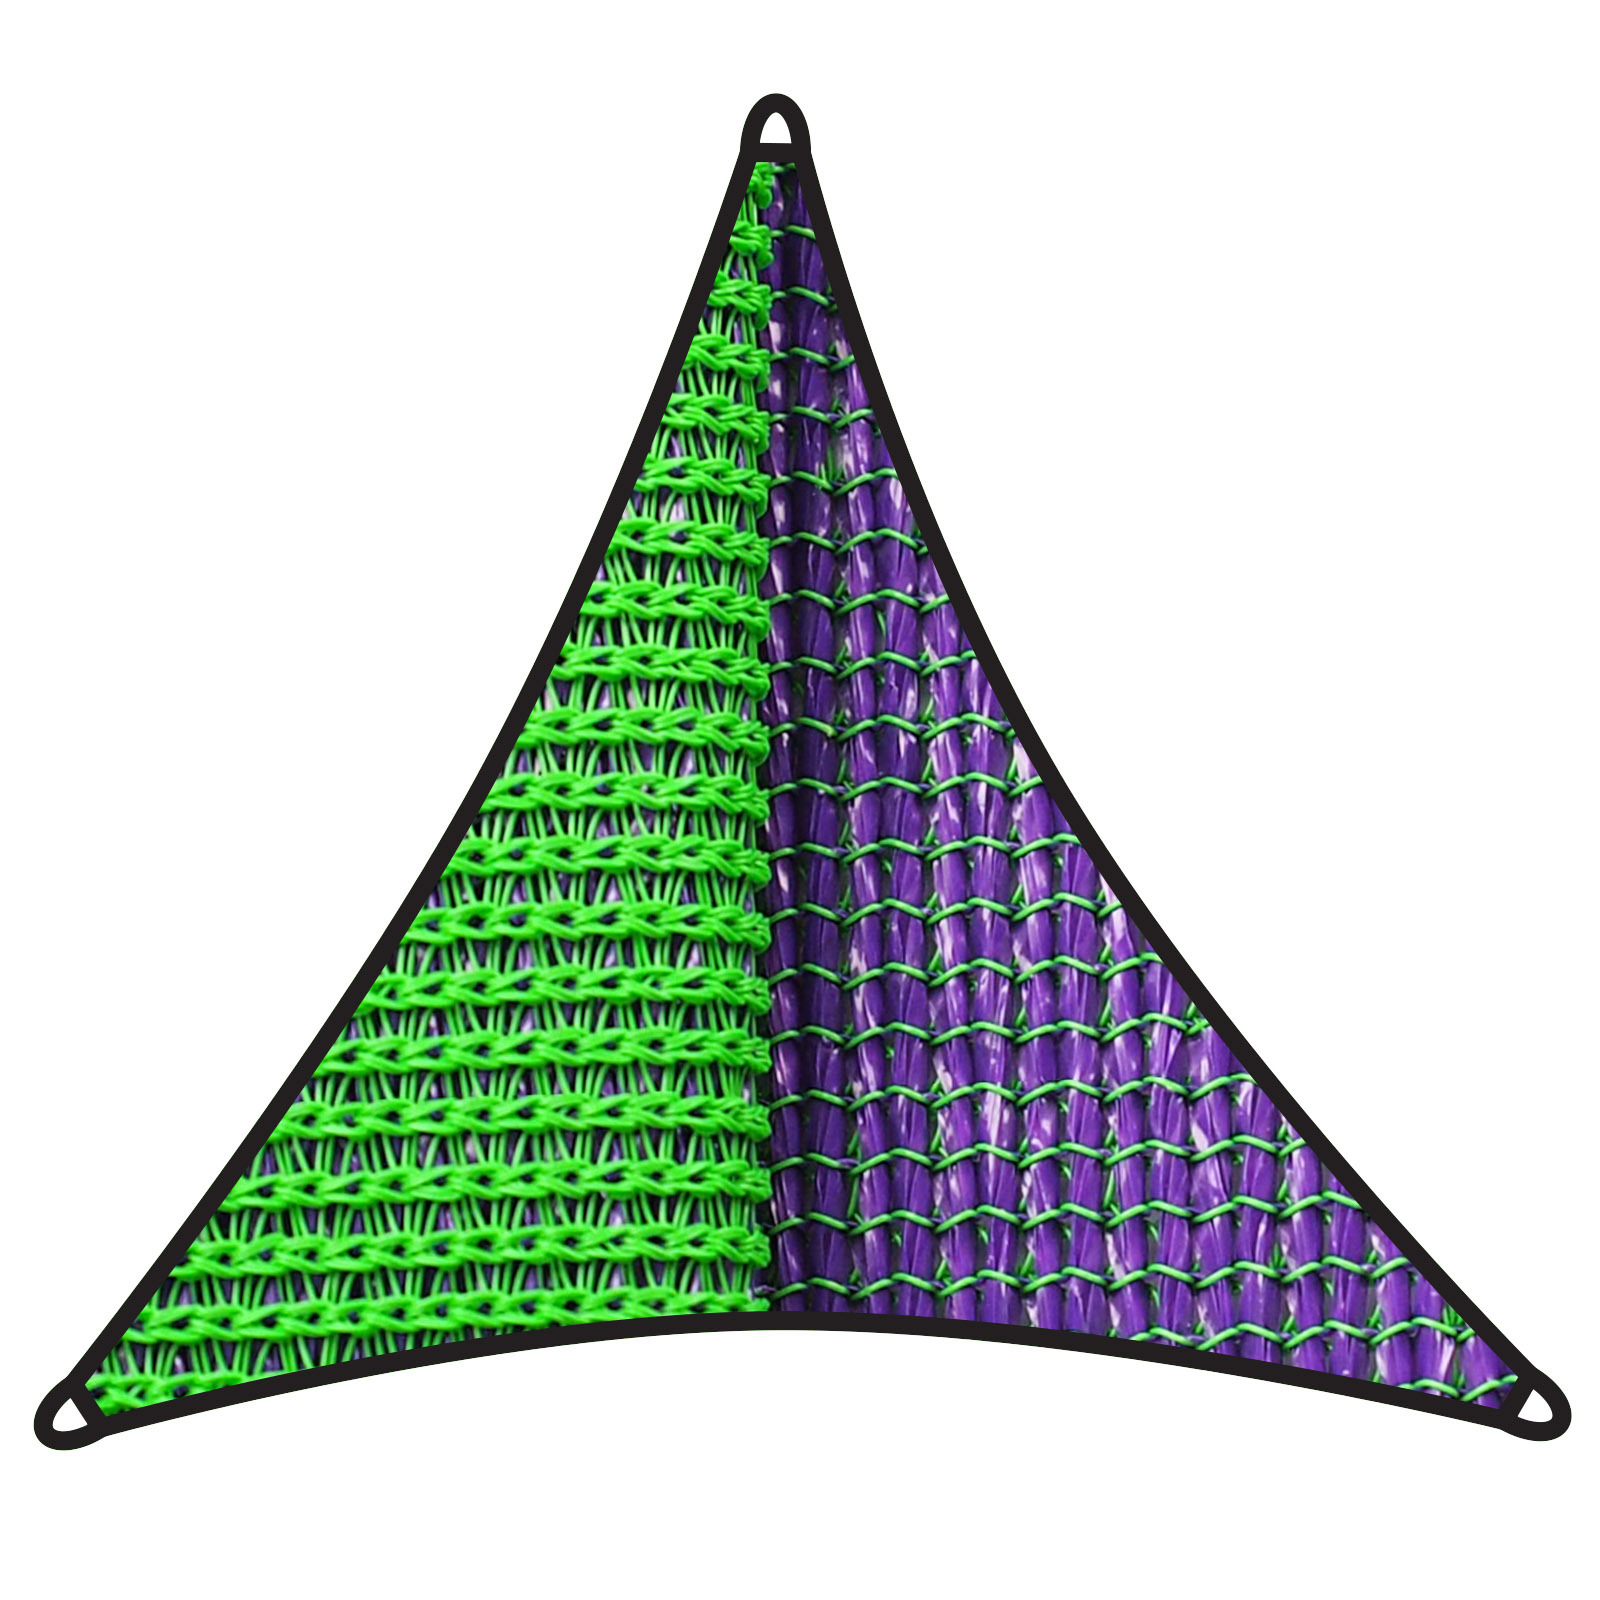 Coolaroo 5m 350gsm Chameleon Triangle Dual Shade Sail